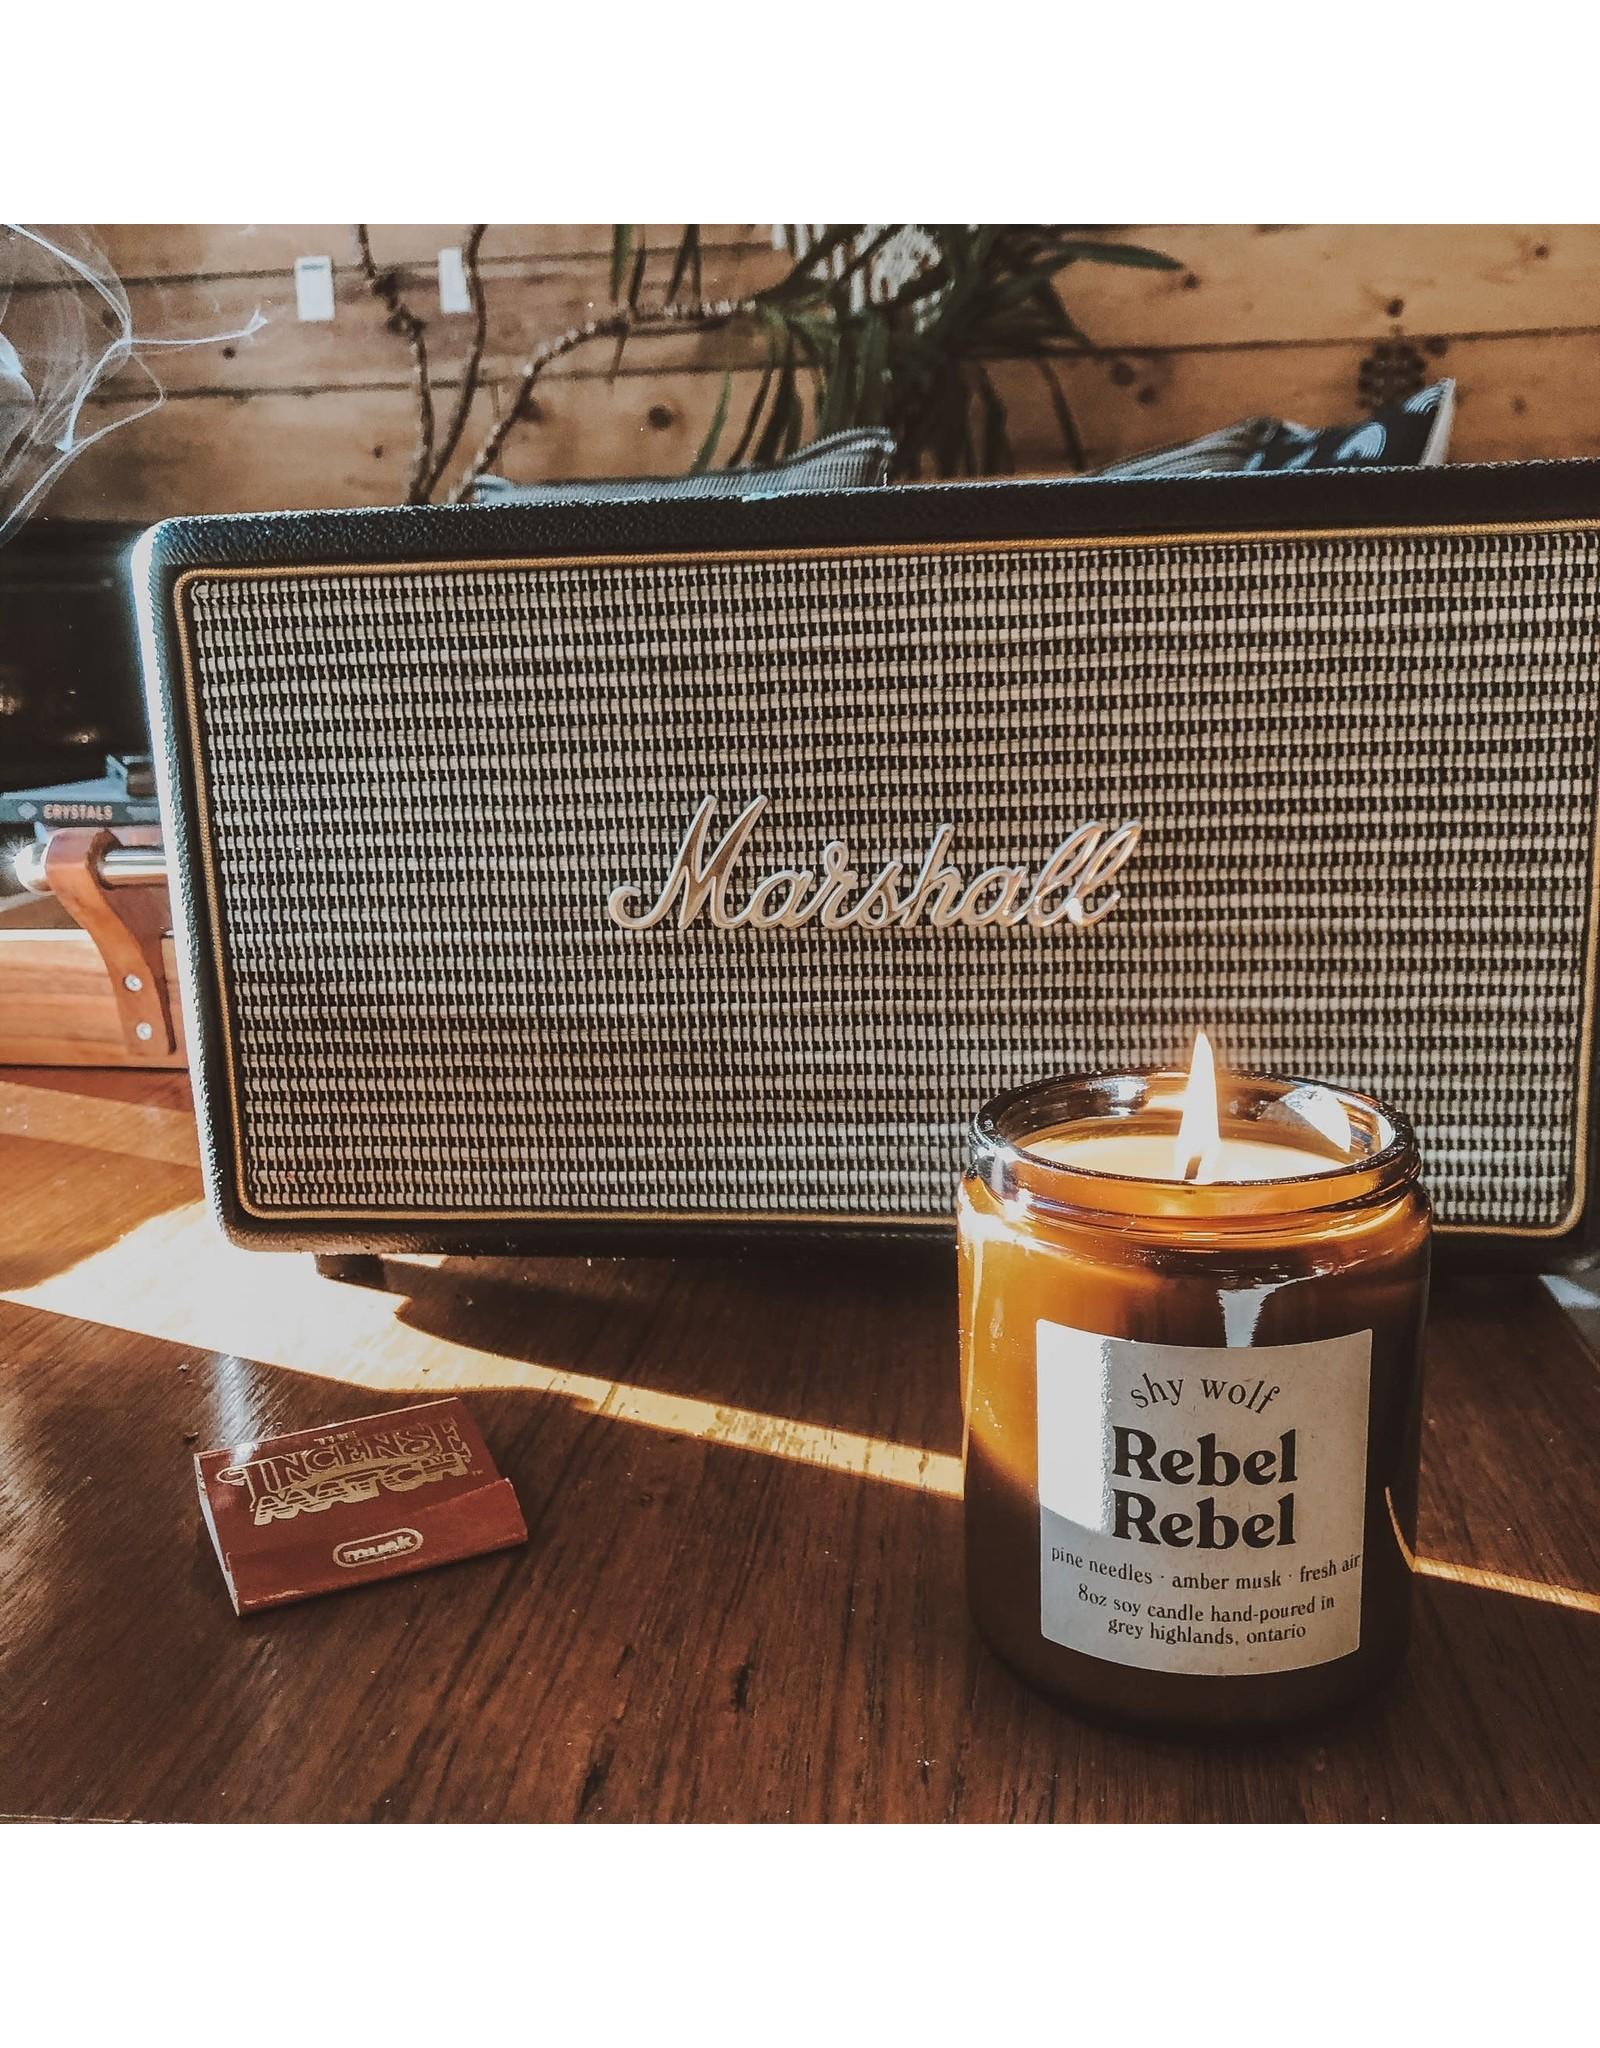 Shy Wolf - Rebel Rebel Candle - 8 oz